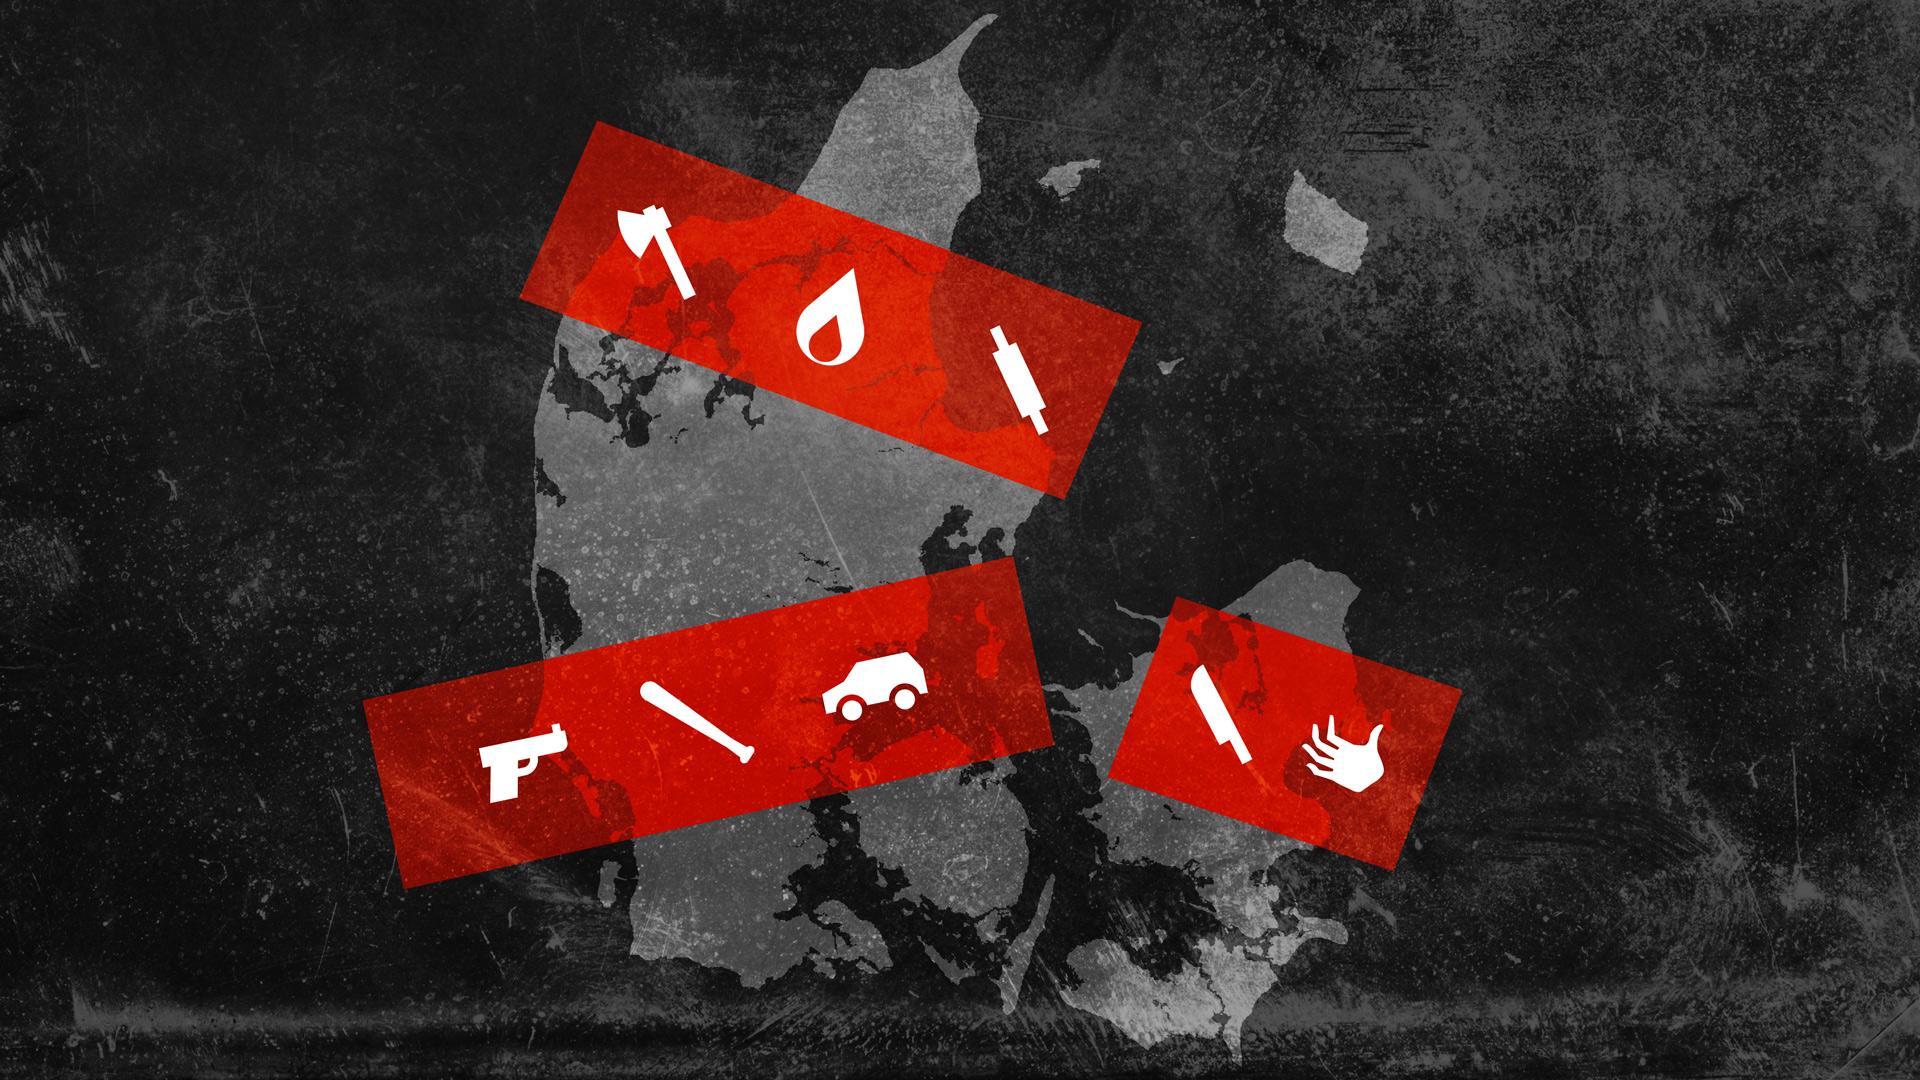 Se hvor drab i Danmark er begået